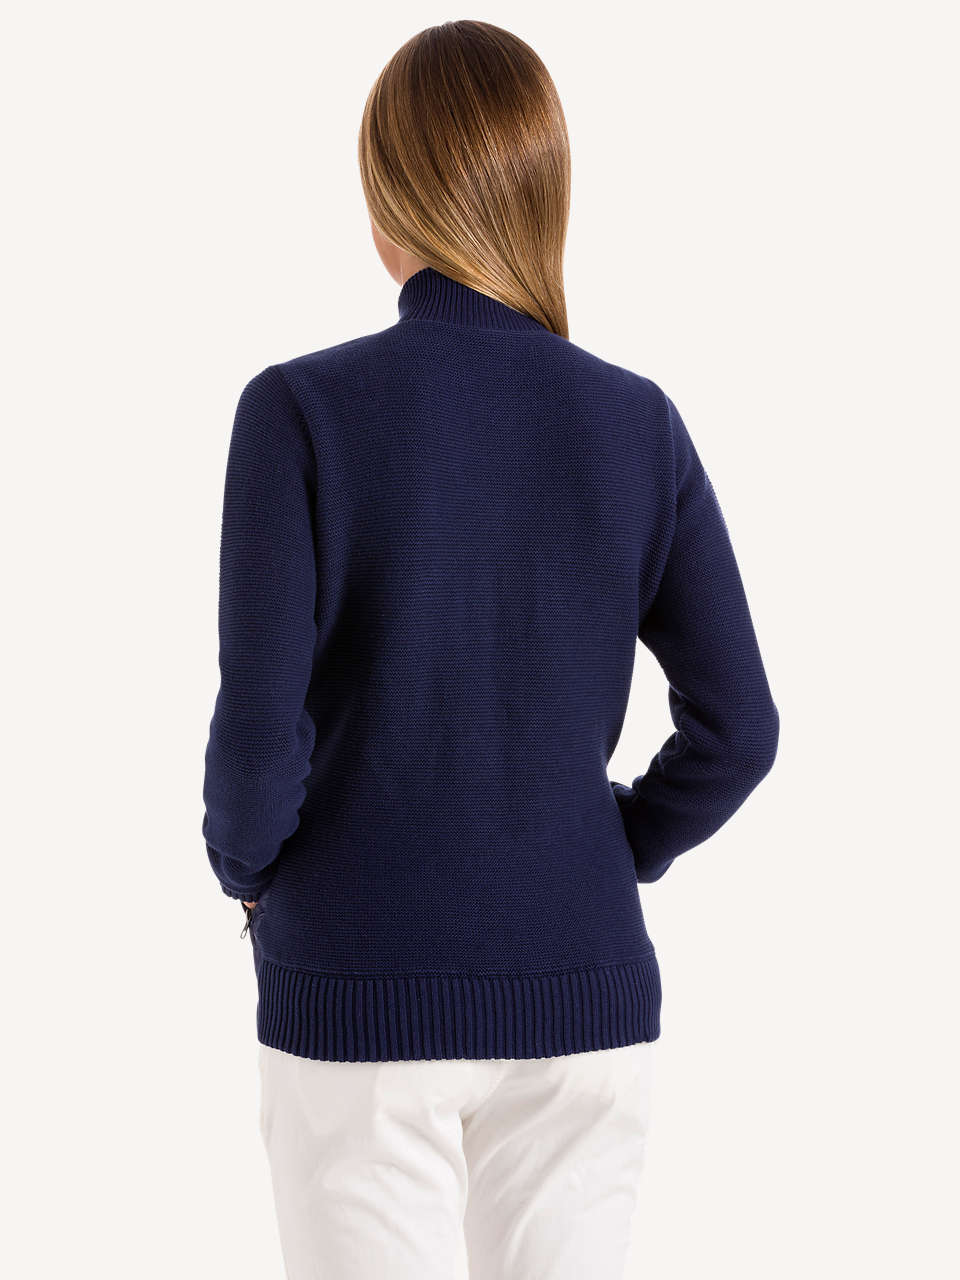 North Super Light Knitted Jacket